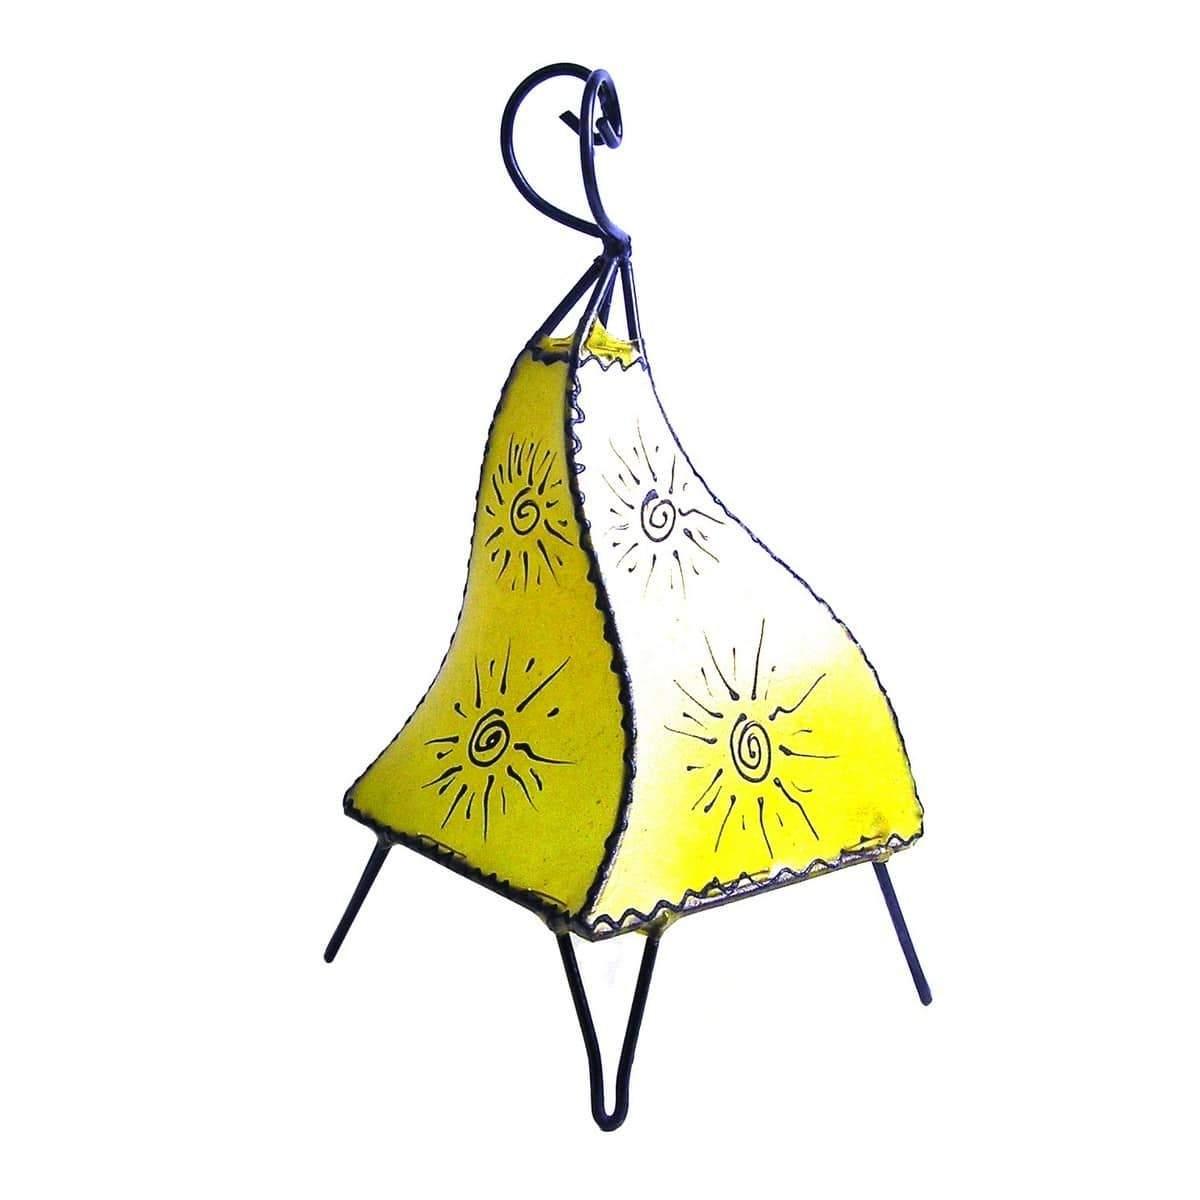 orientalische stehlampe hennalampe marokkanische lederlampe mel s. Black Bedroom Furniture Sets. Home Design Ideas